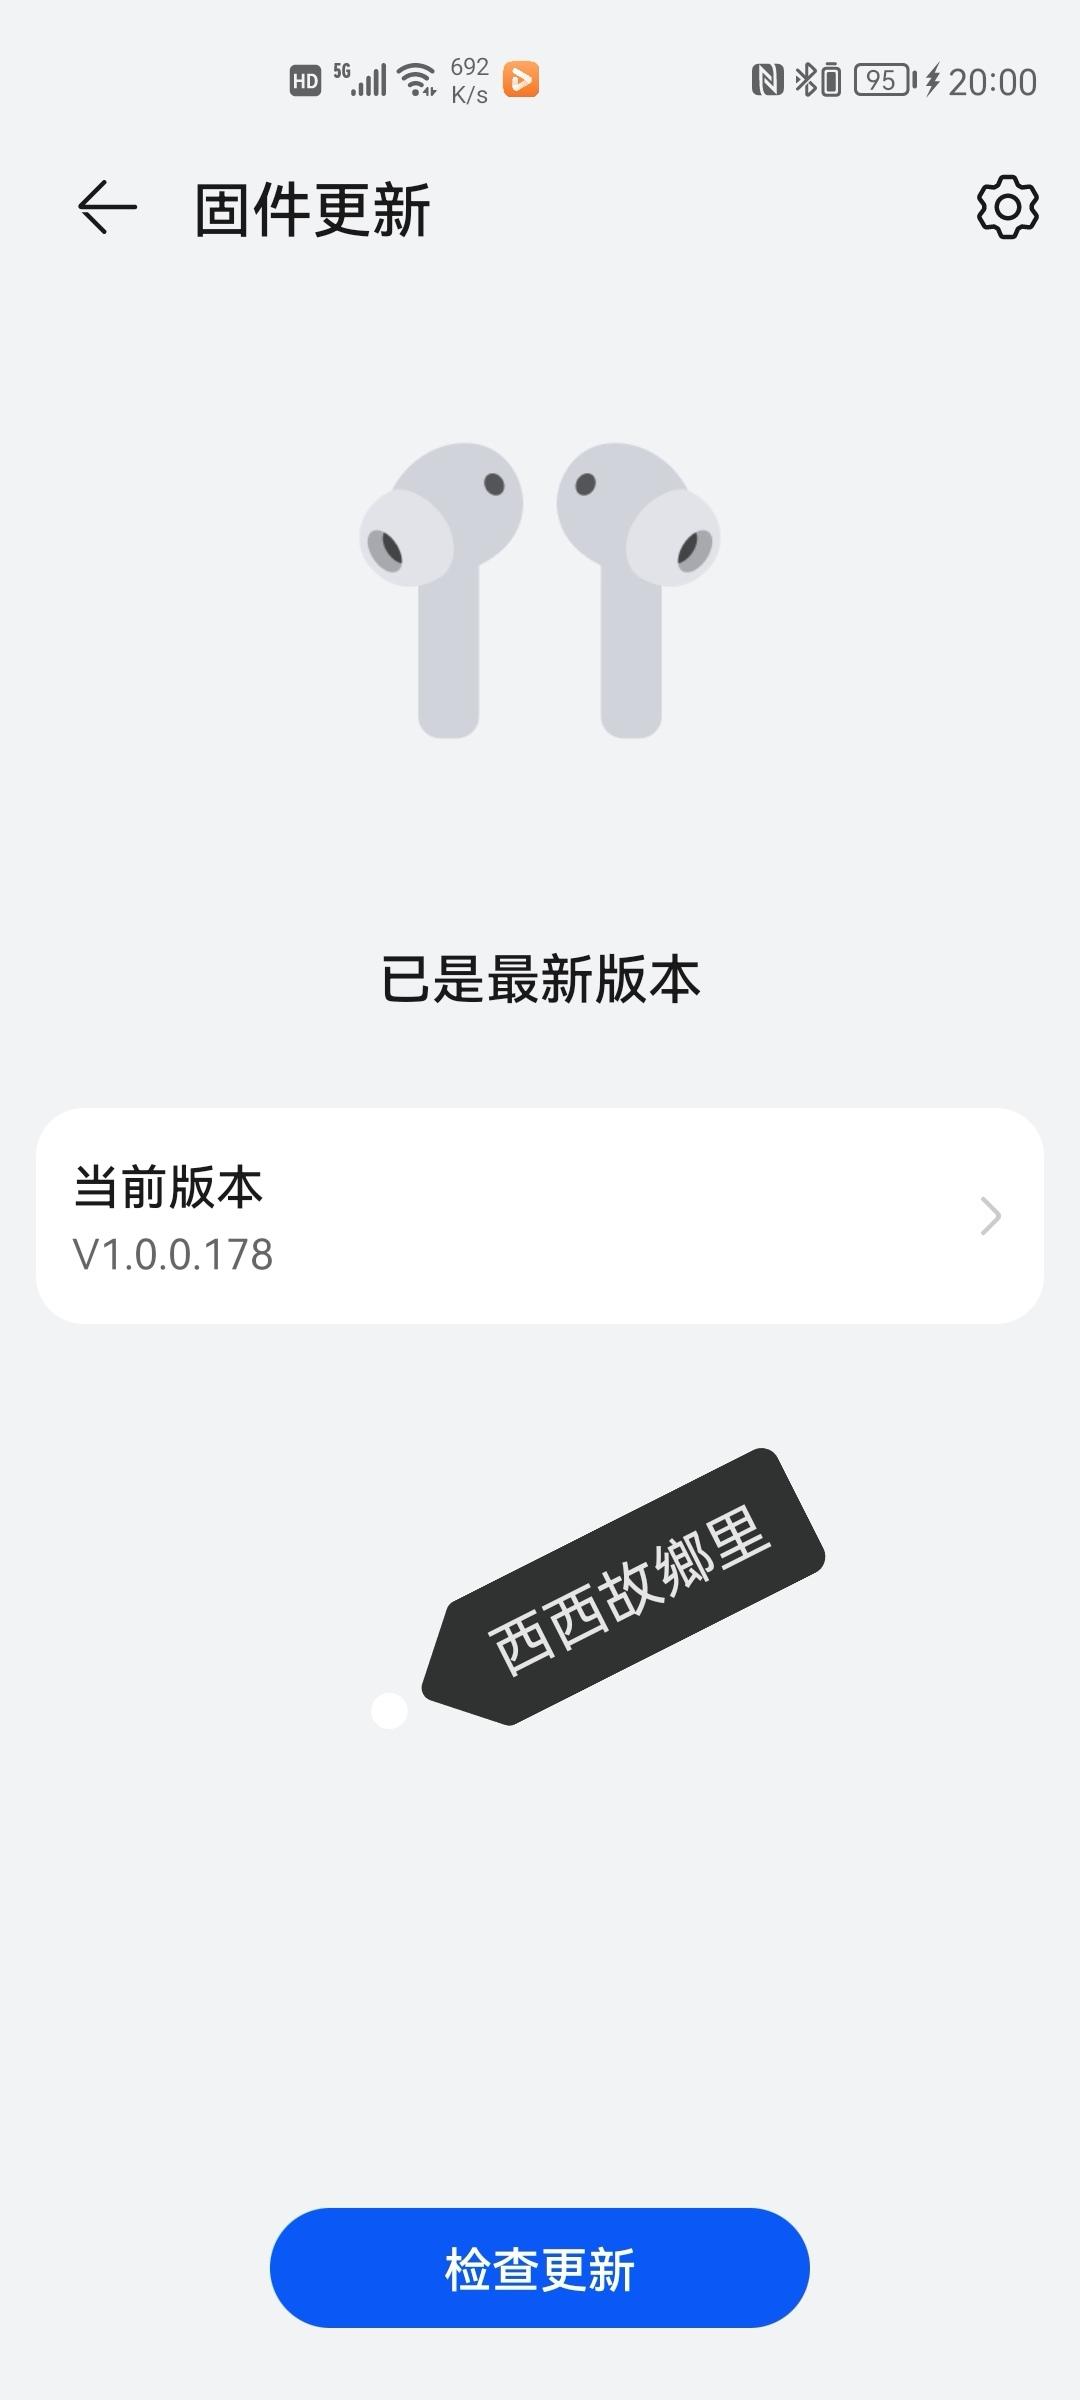 Screenshot_20210705_200005_com.huawei.smarthome_edit_77278523460082.jpg